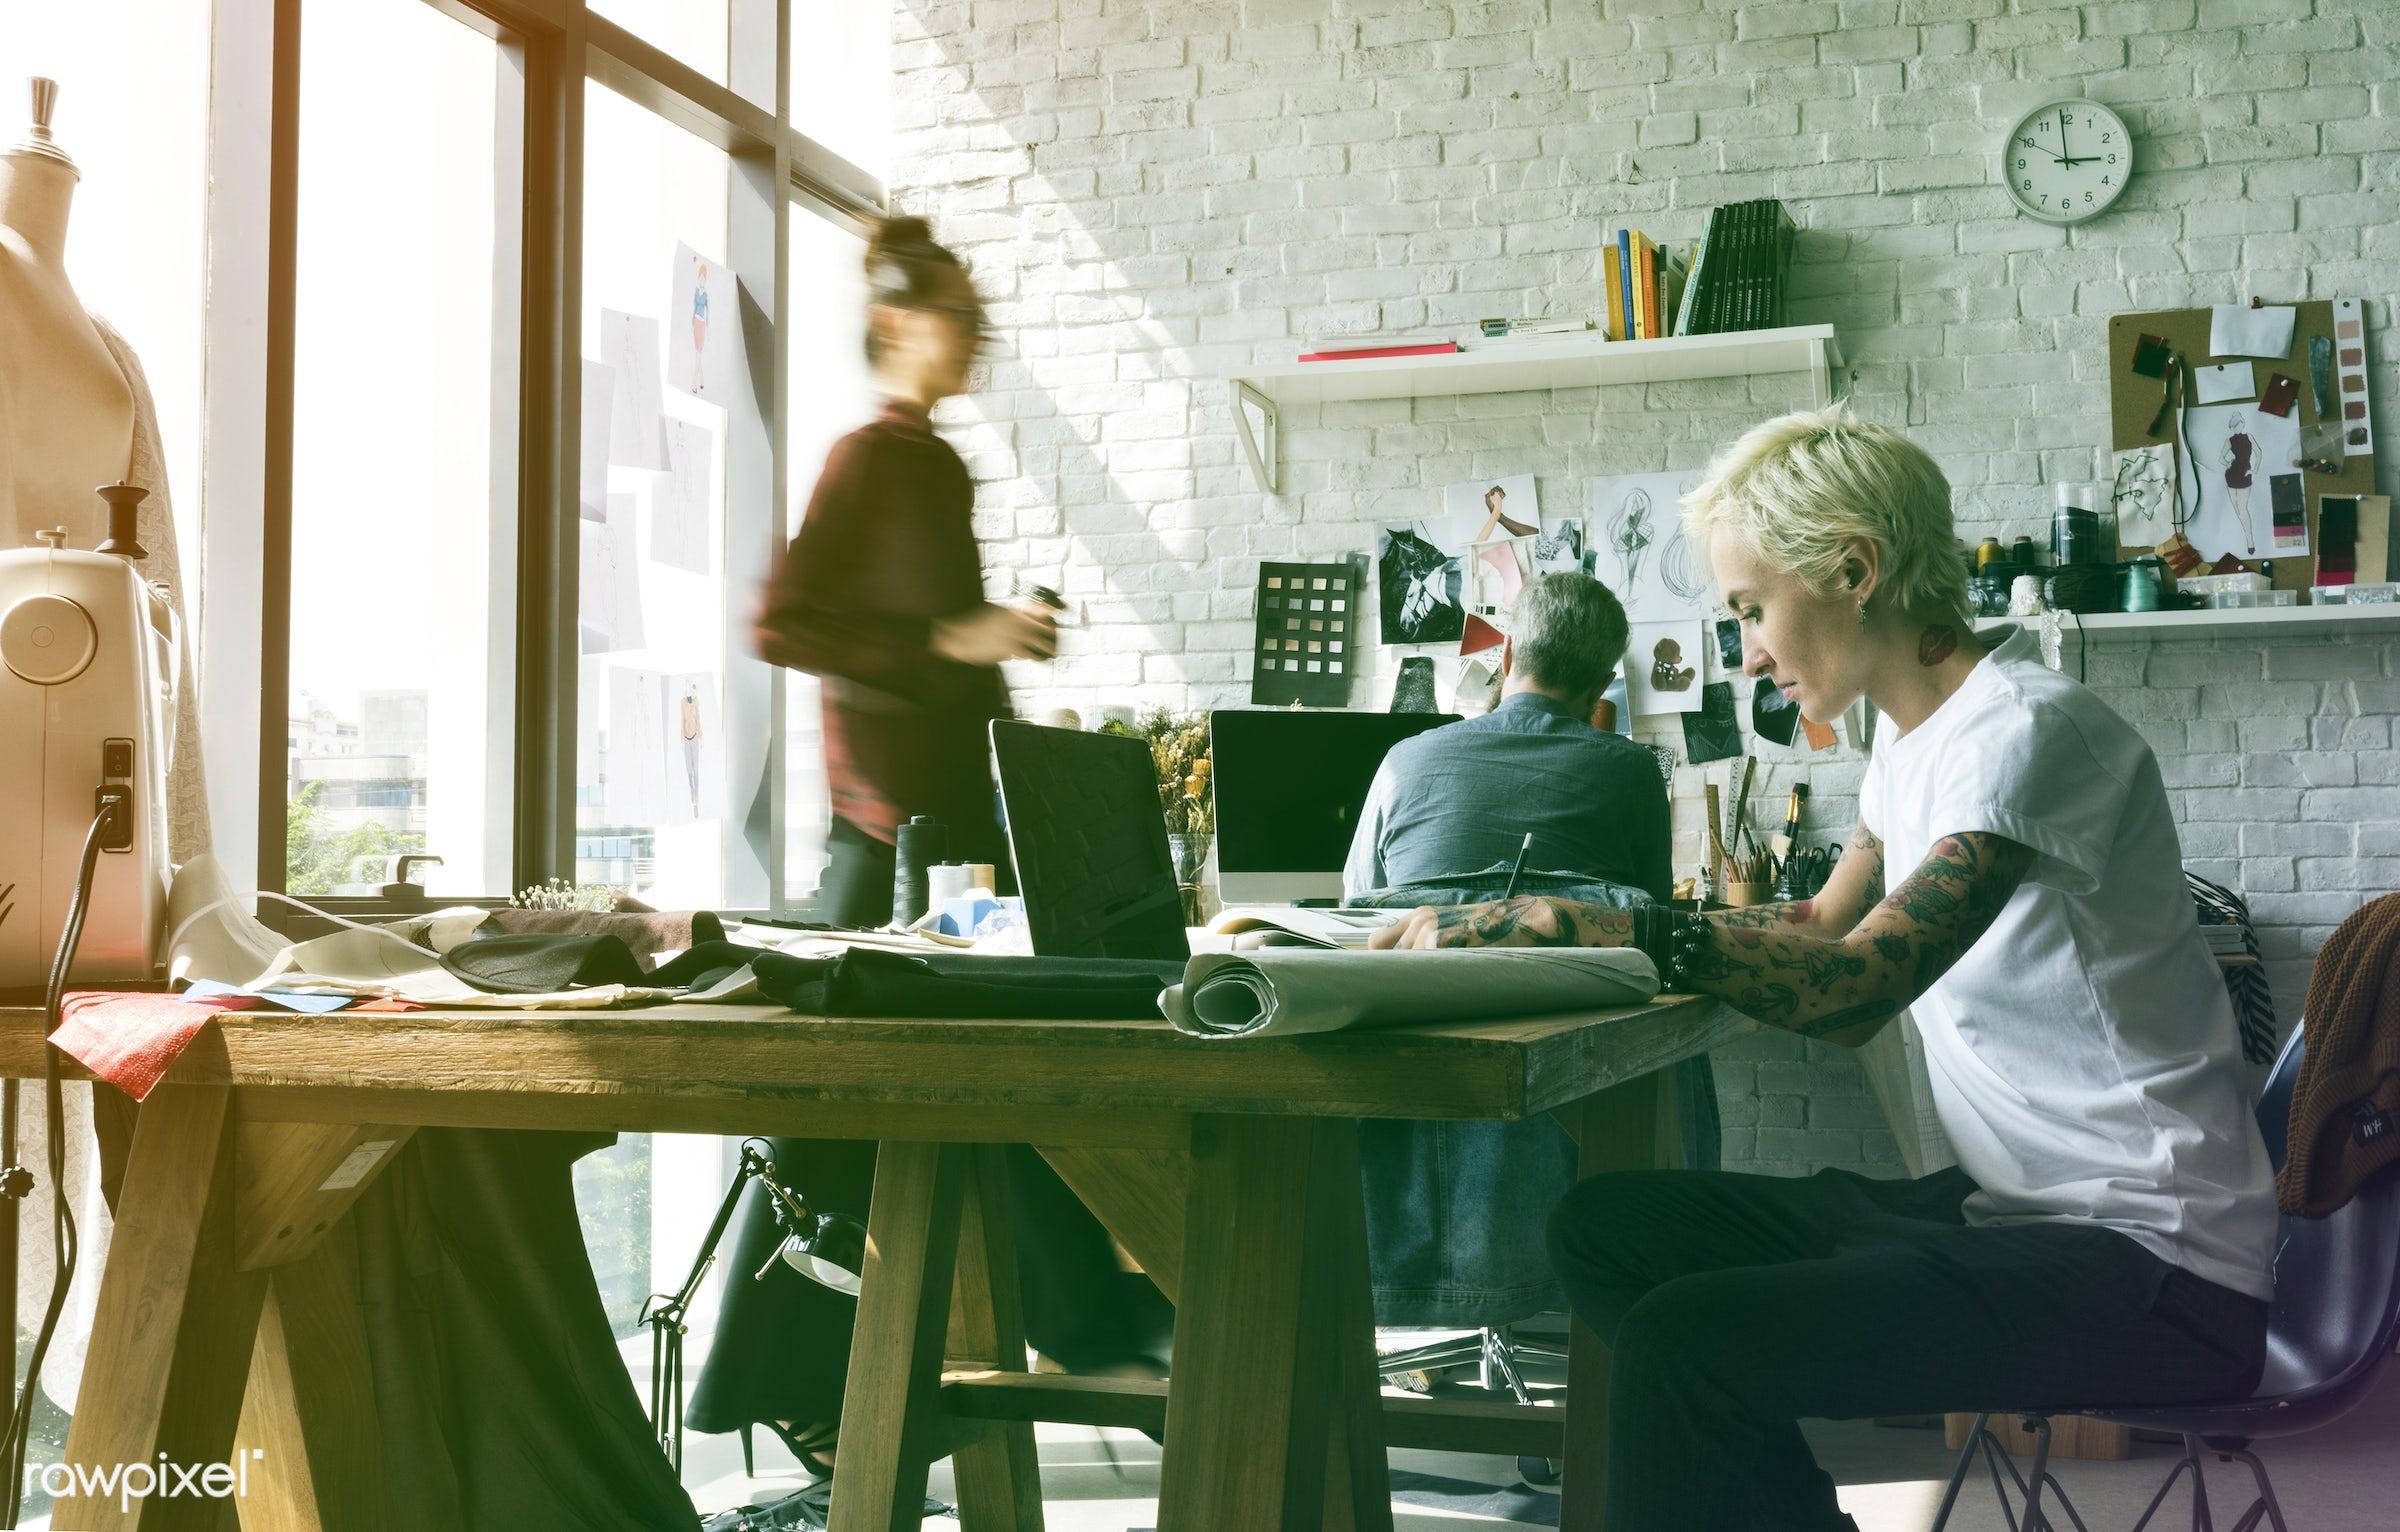 manufacturing, person, design industry, people, draw, decor, designers, tattoo, work, workshop, fashion designing, creative...